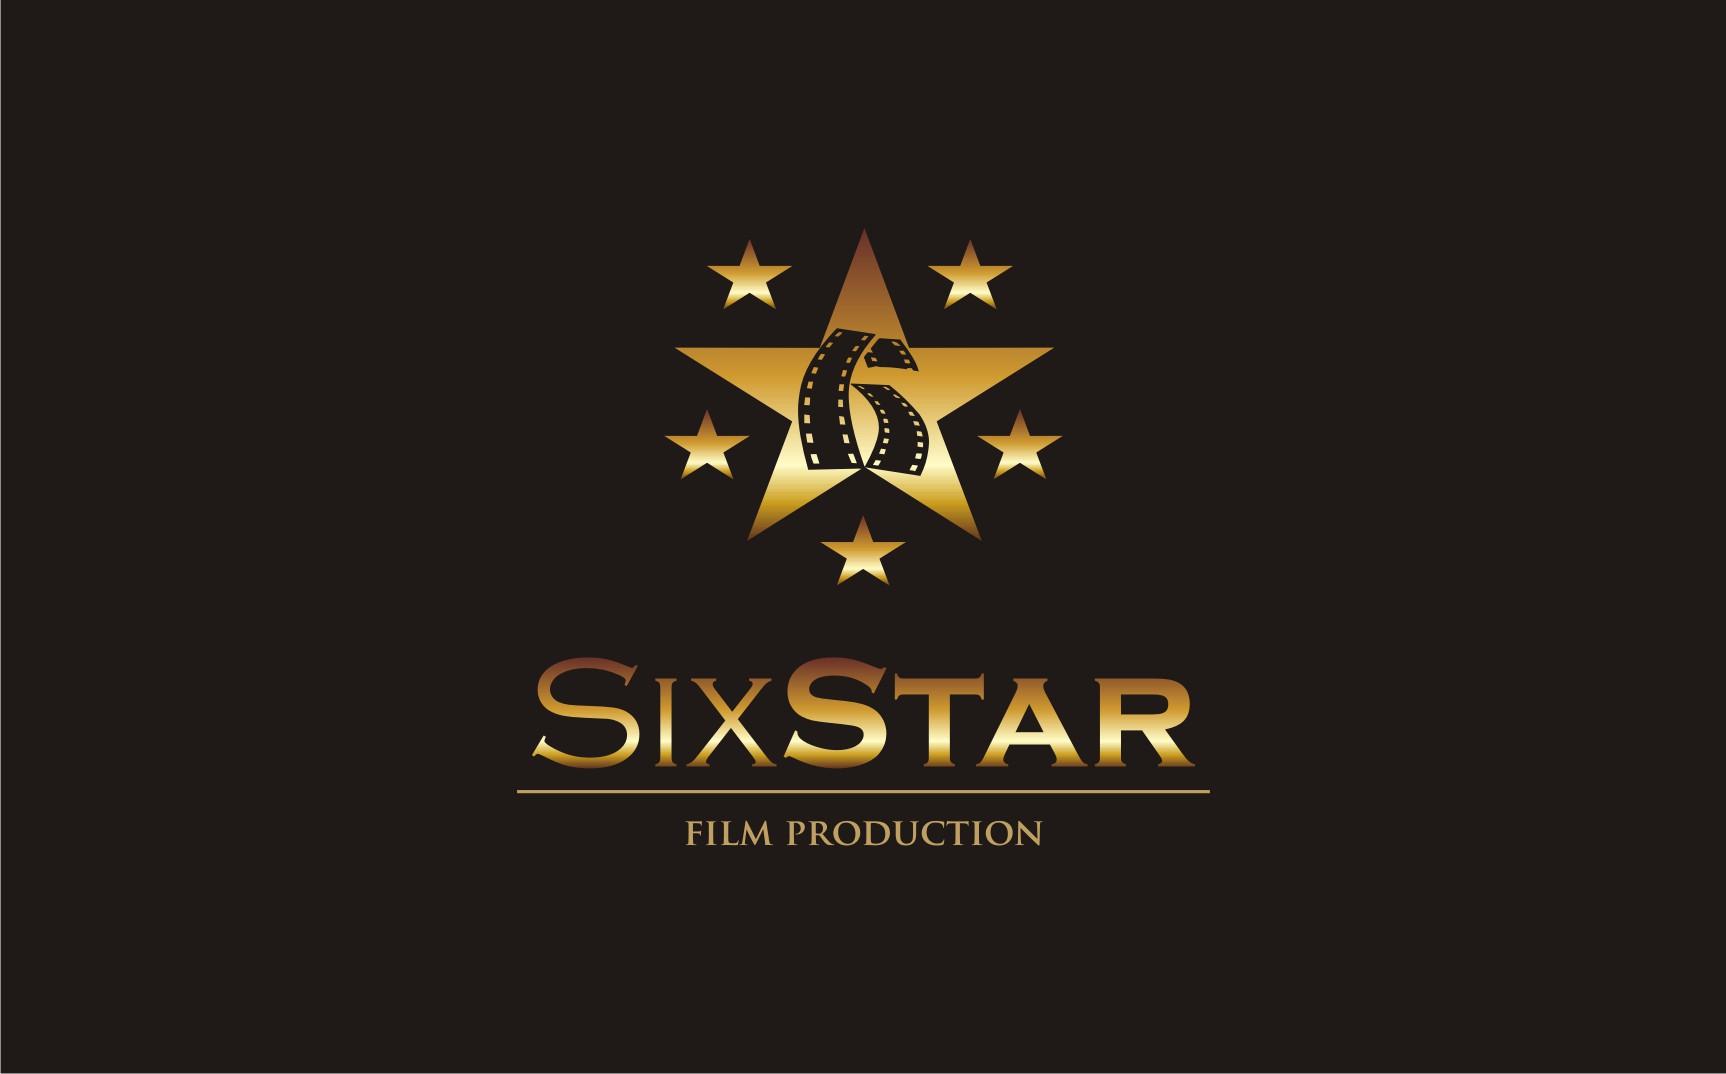 Six Star Film Production needs a new logo